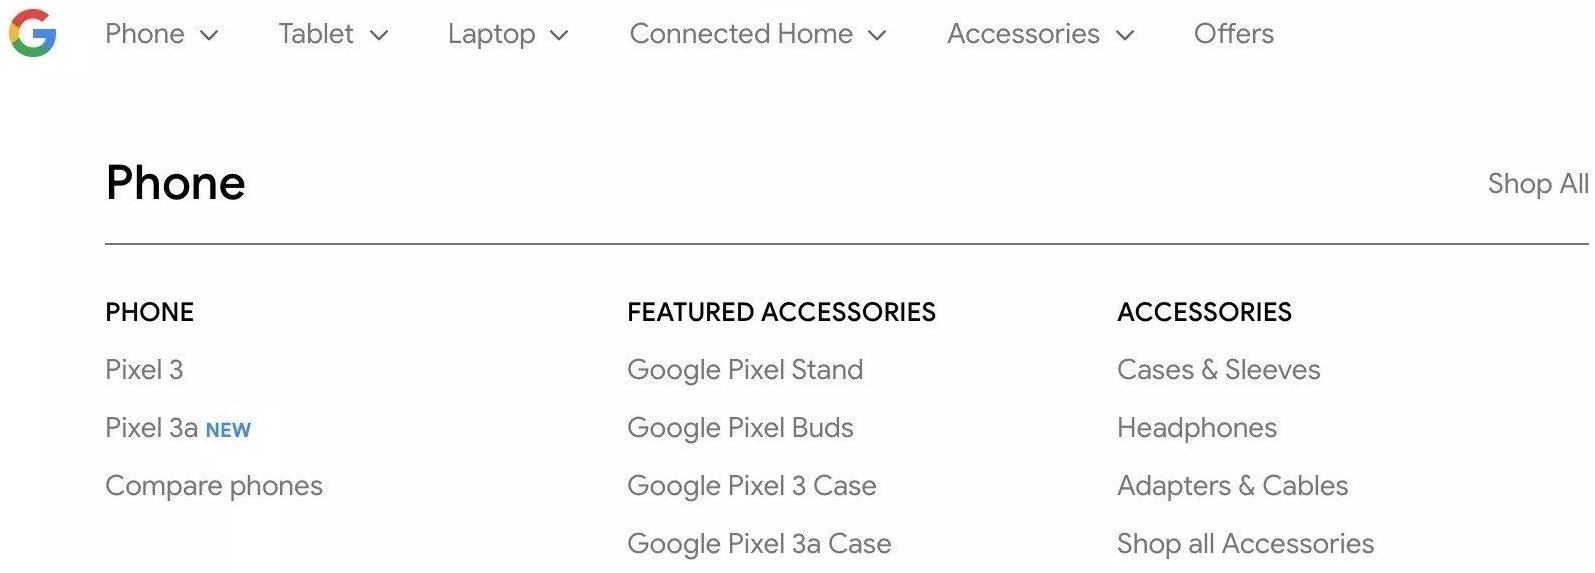 Google Pixel 3a & Pixel 3a XL confirmed by Google